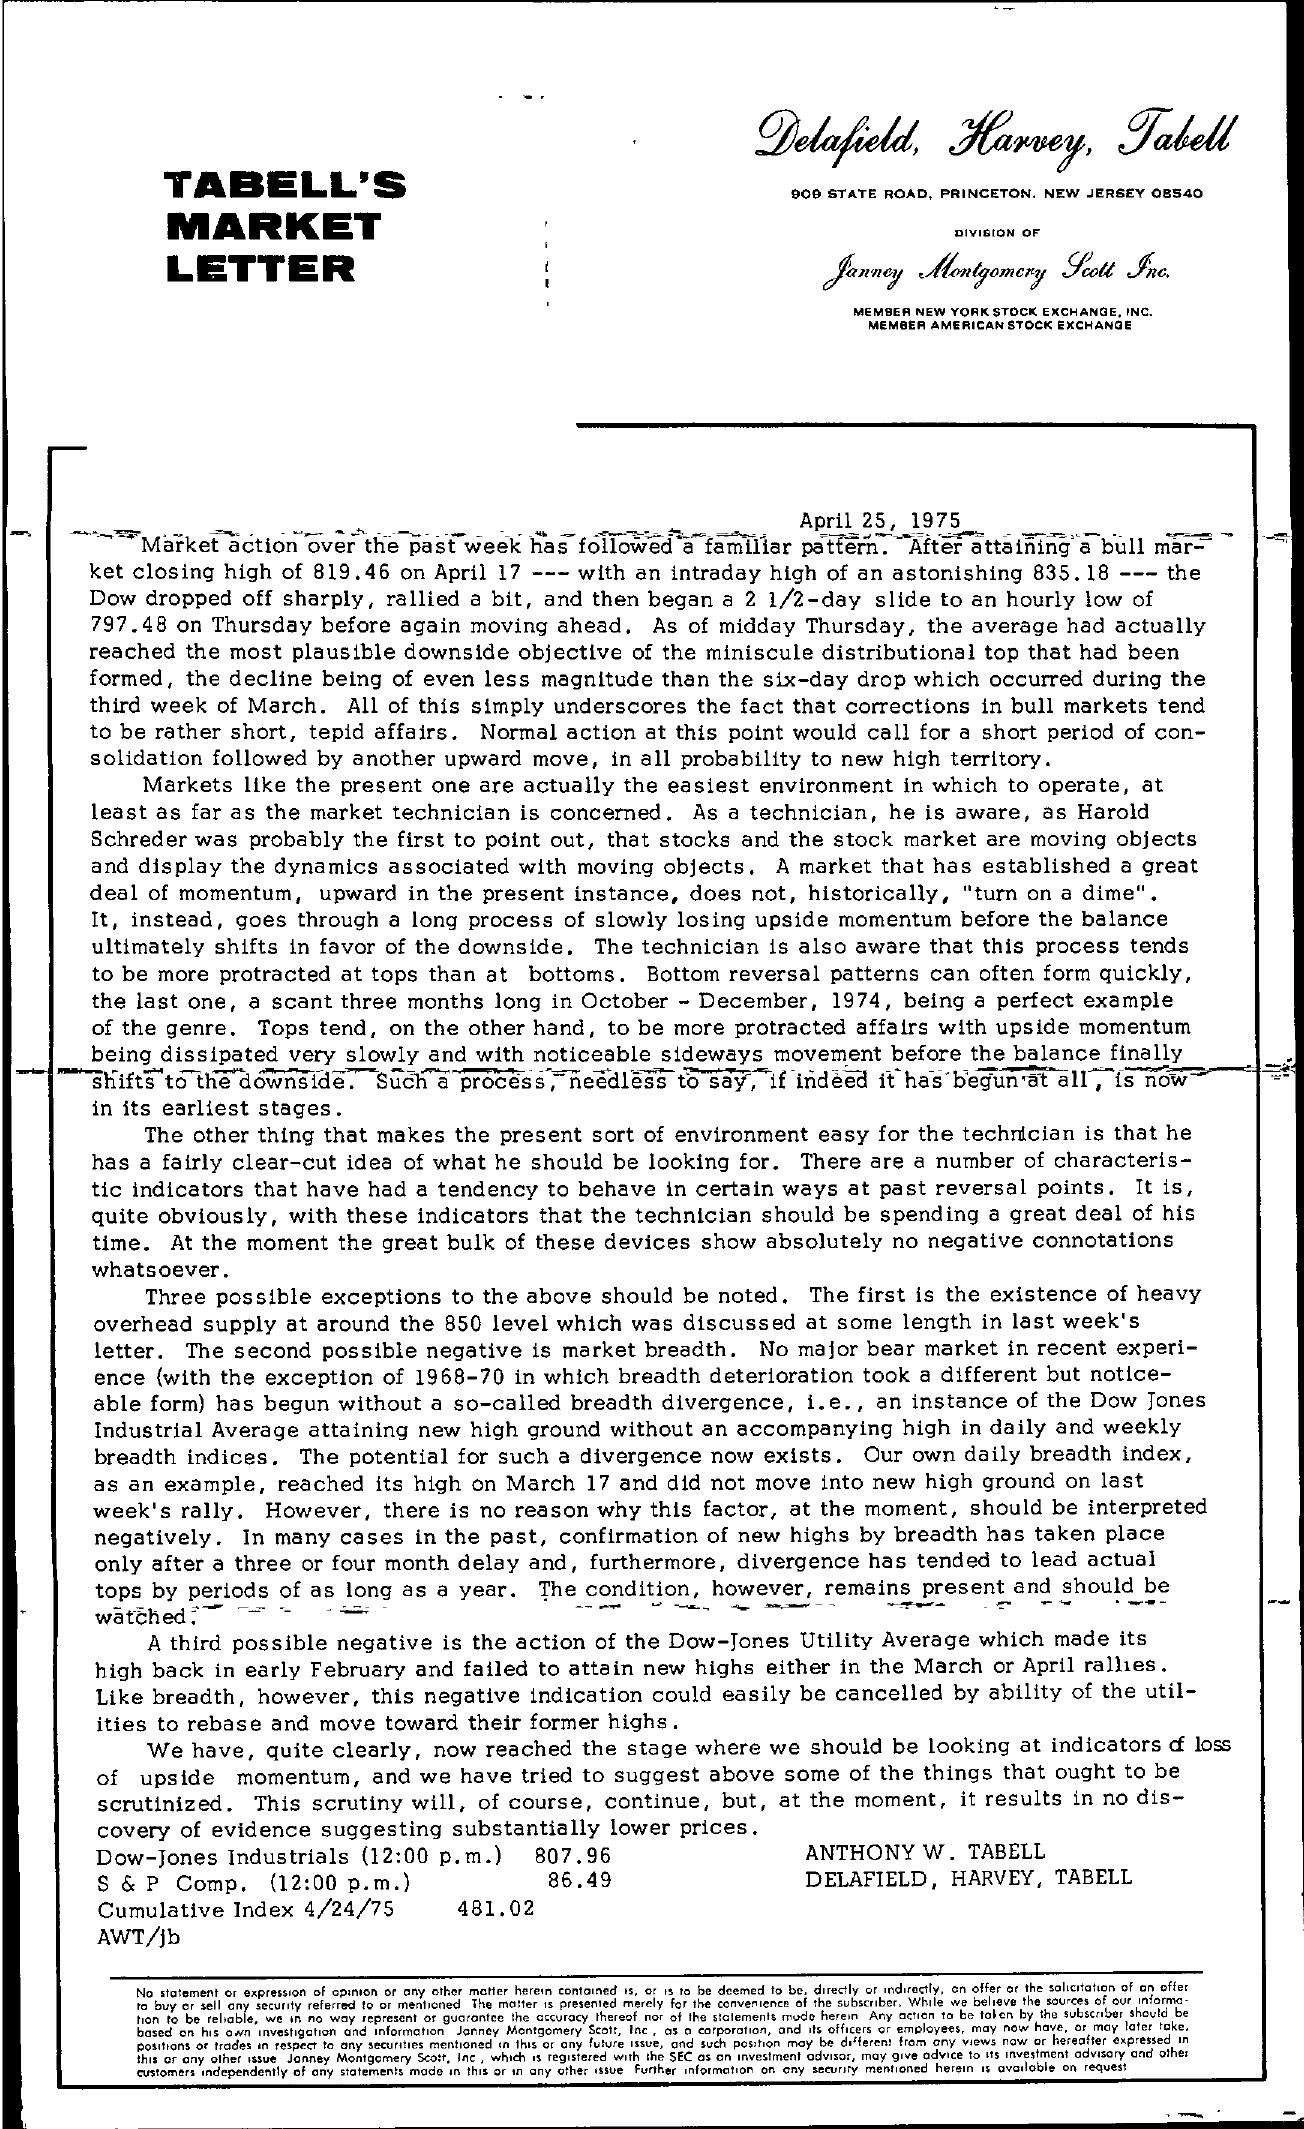 Tabell's Market Letter - April 25, 1975